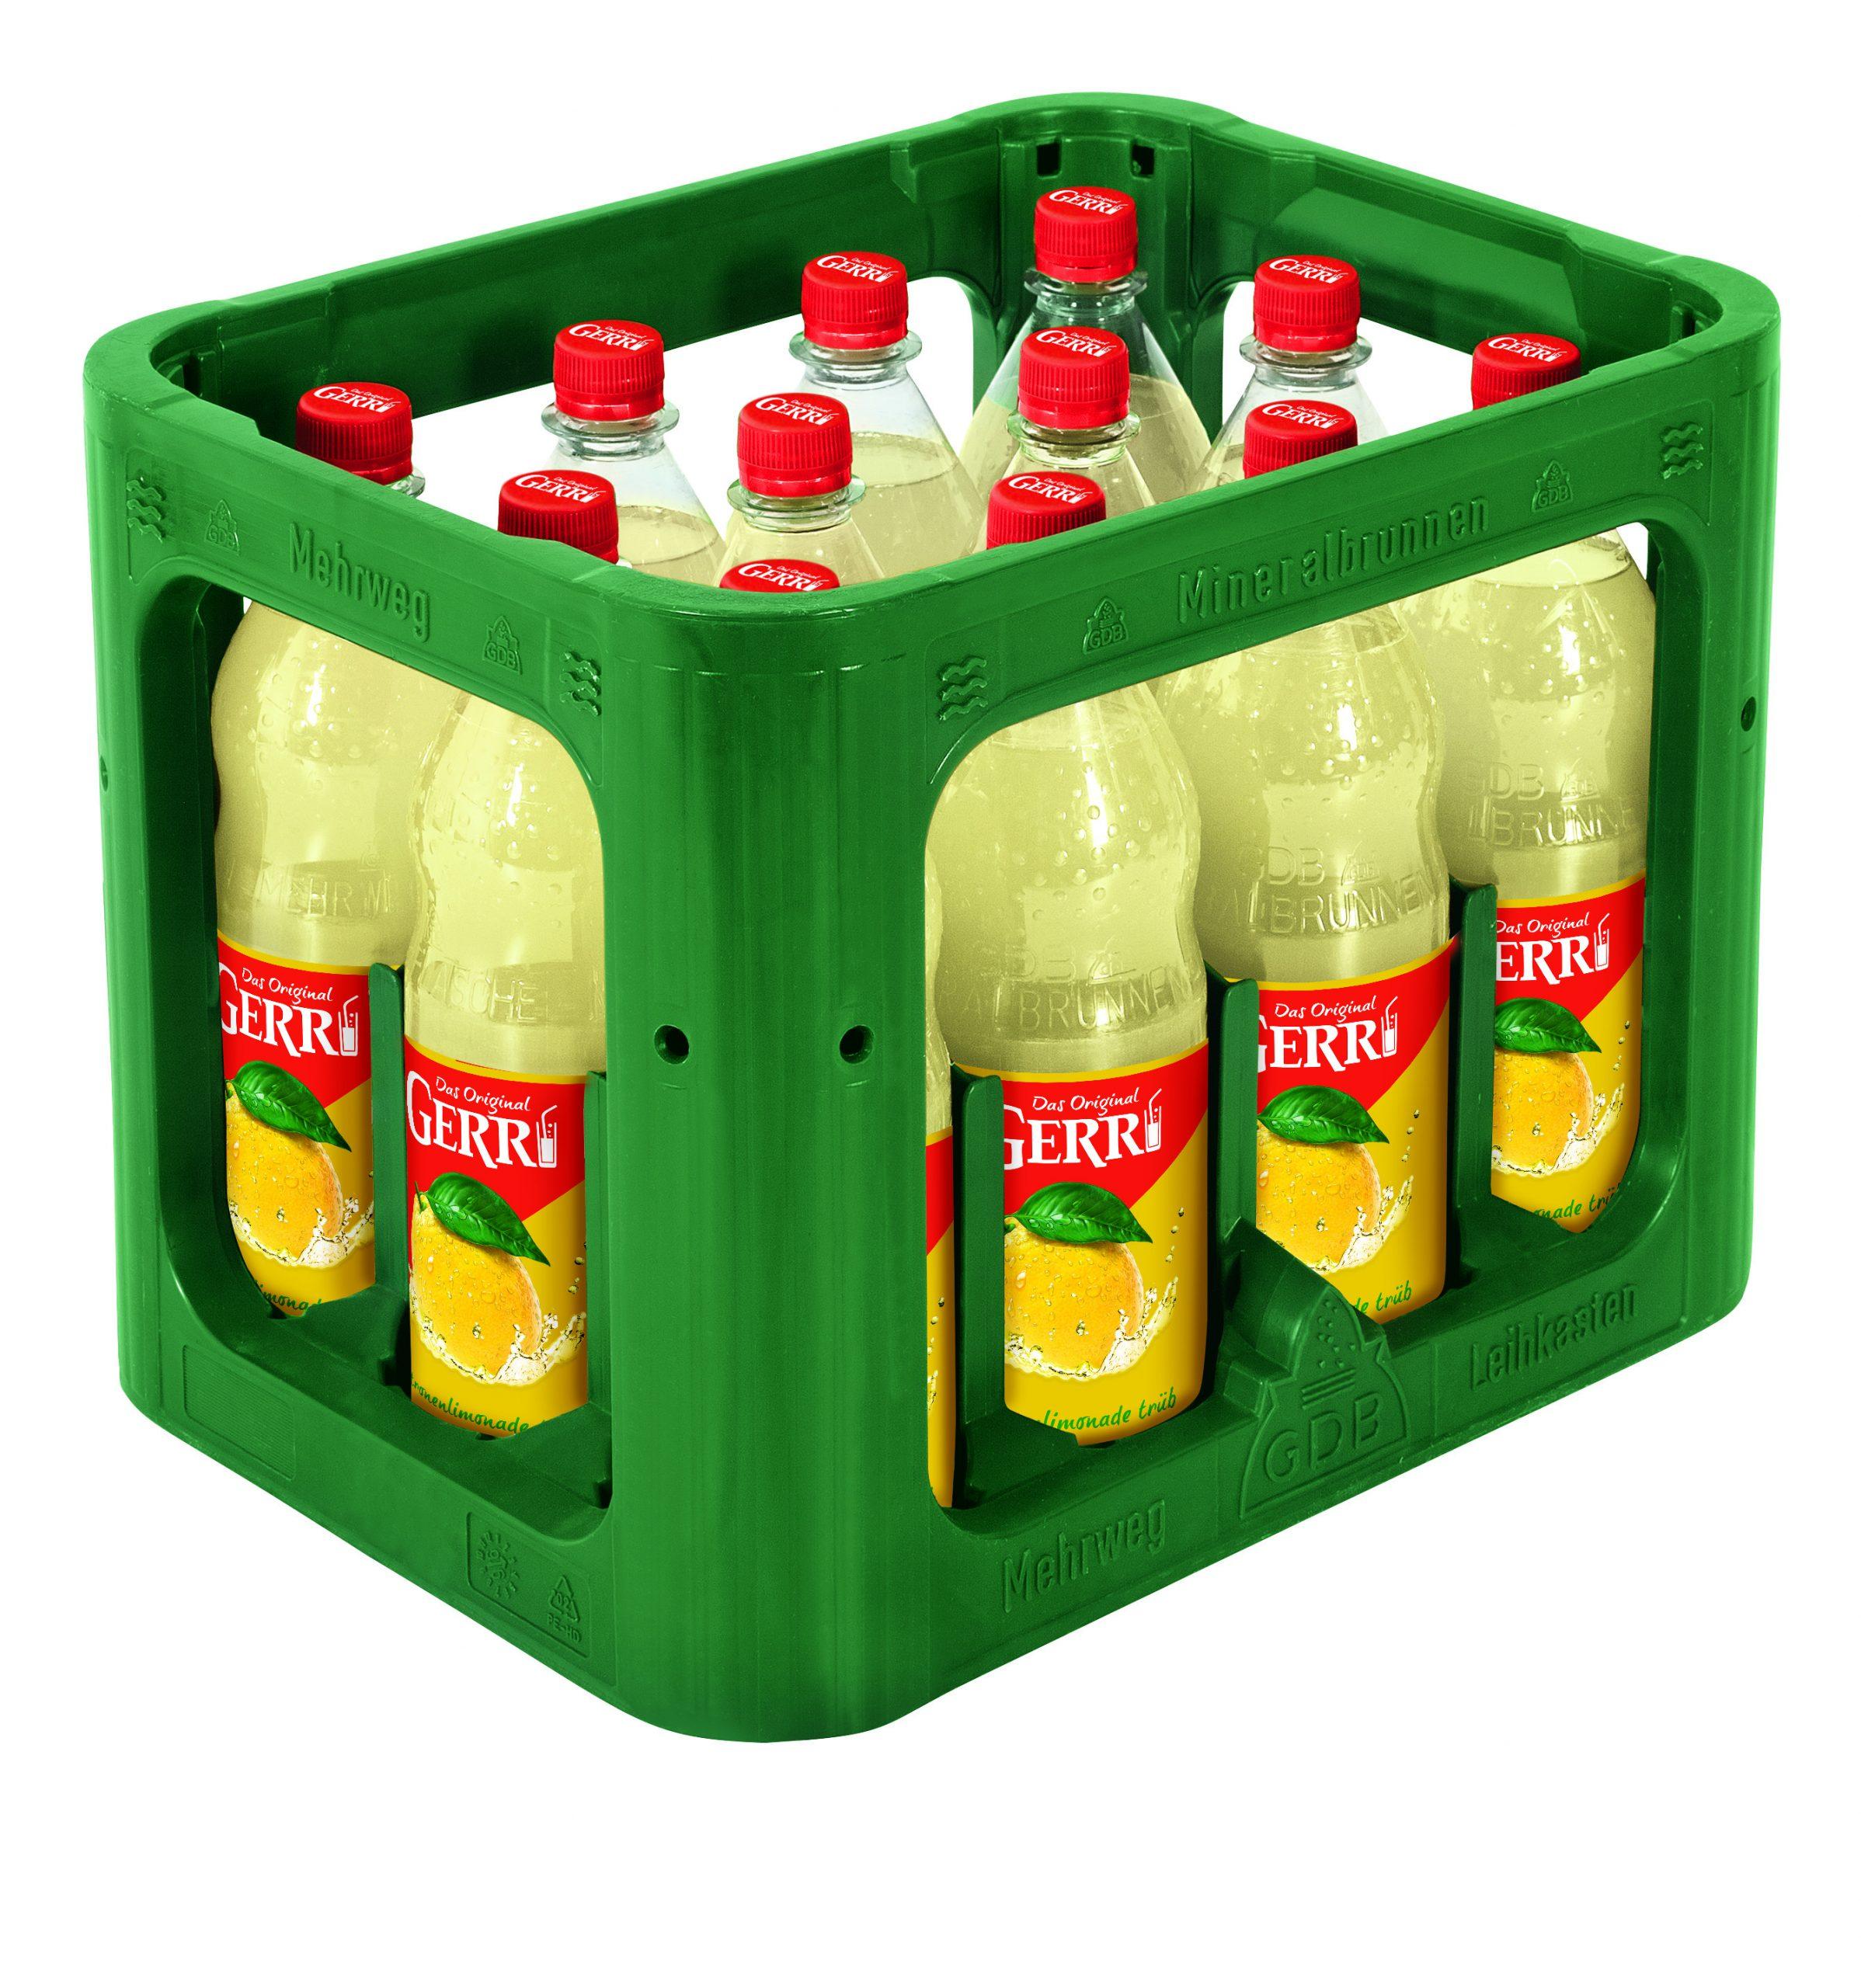 Gerri Limonade Zitrone trüb 12x1,0l Mehrweg PET